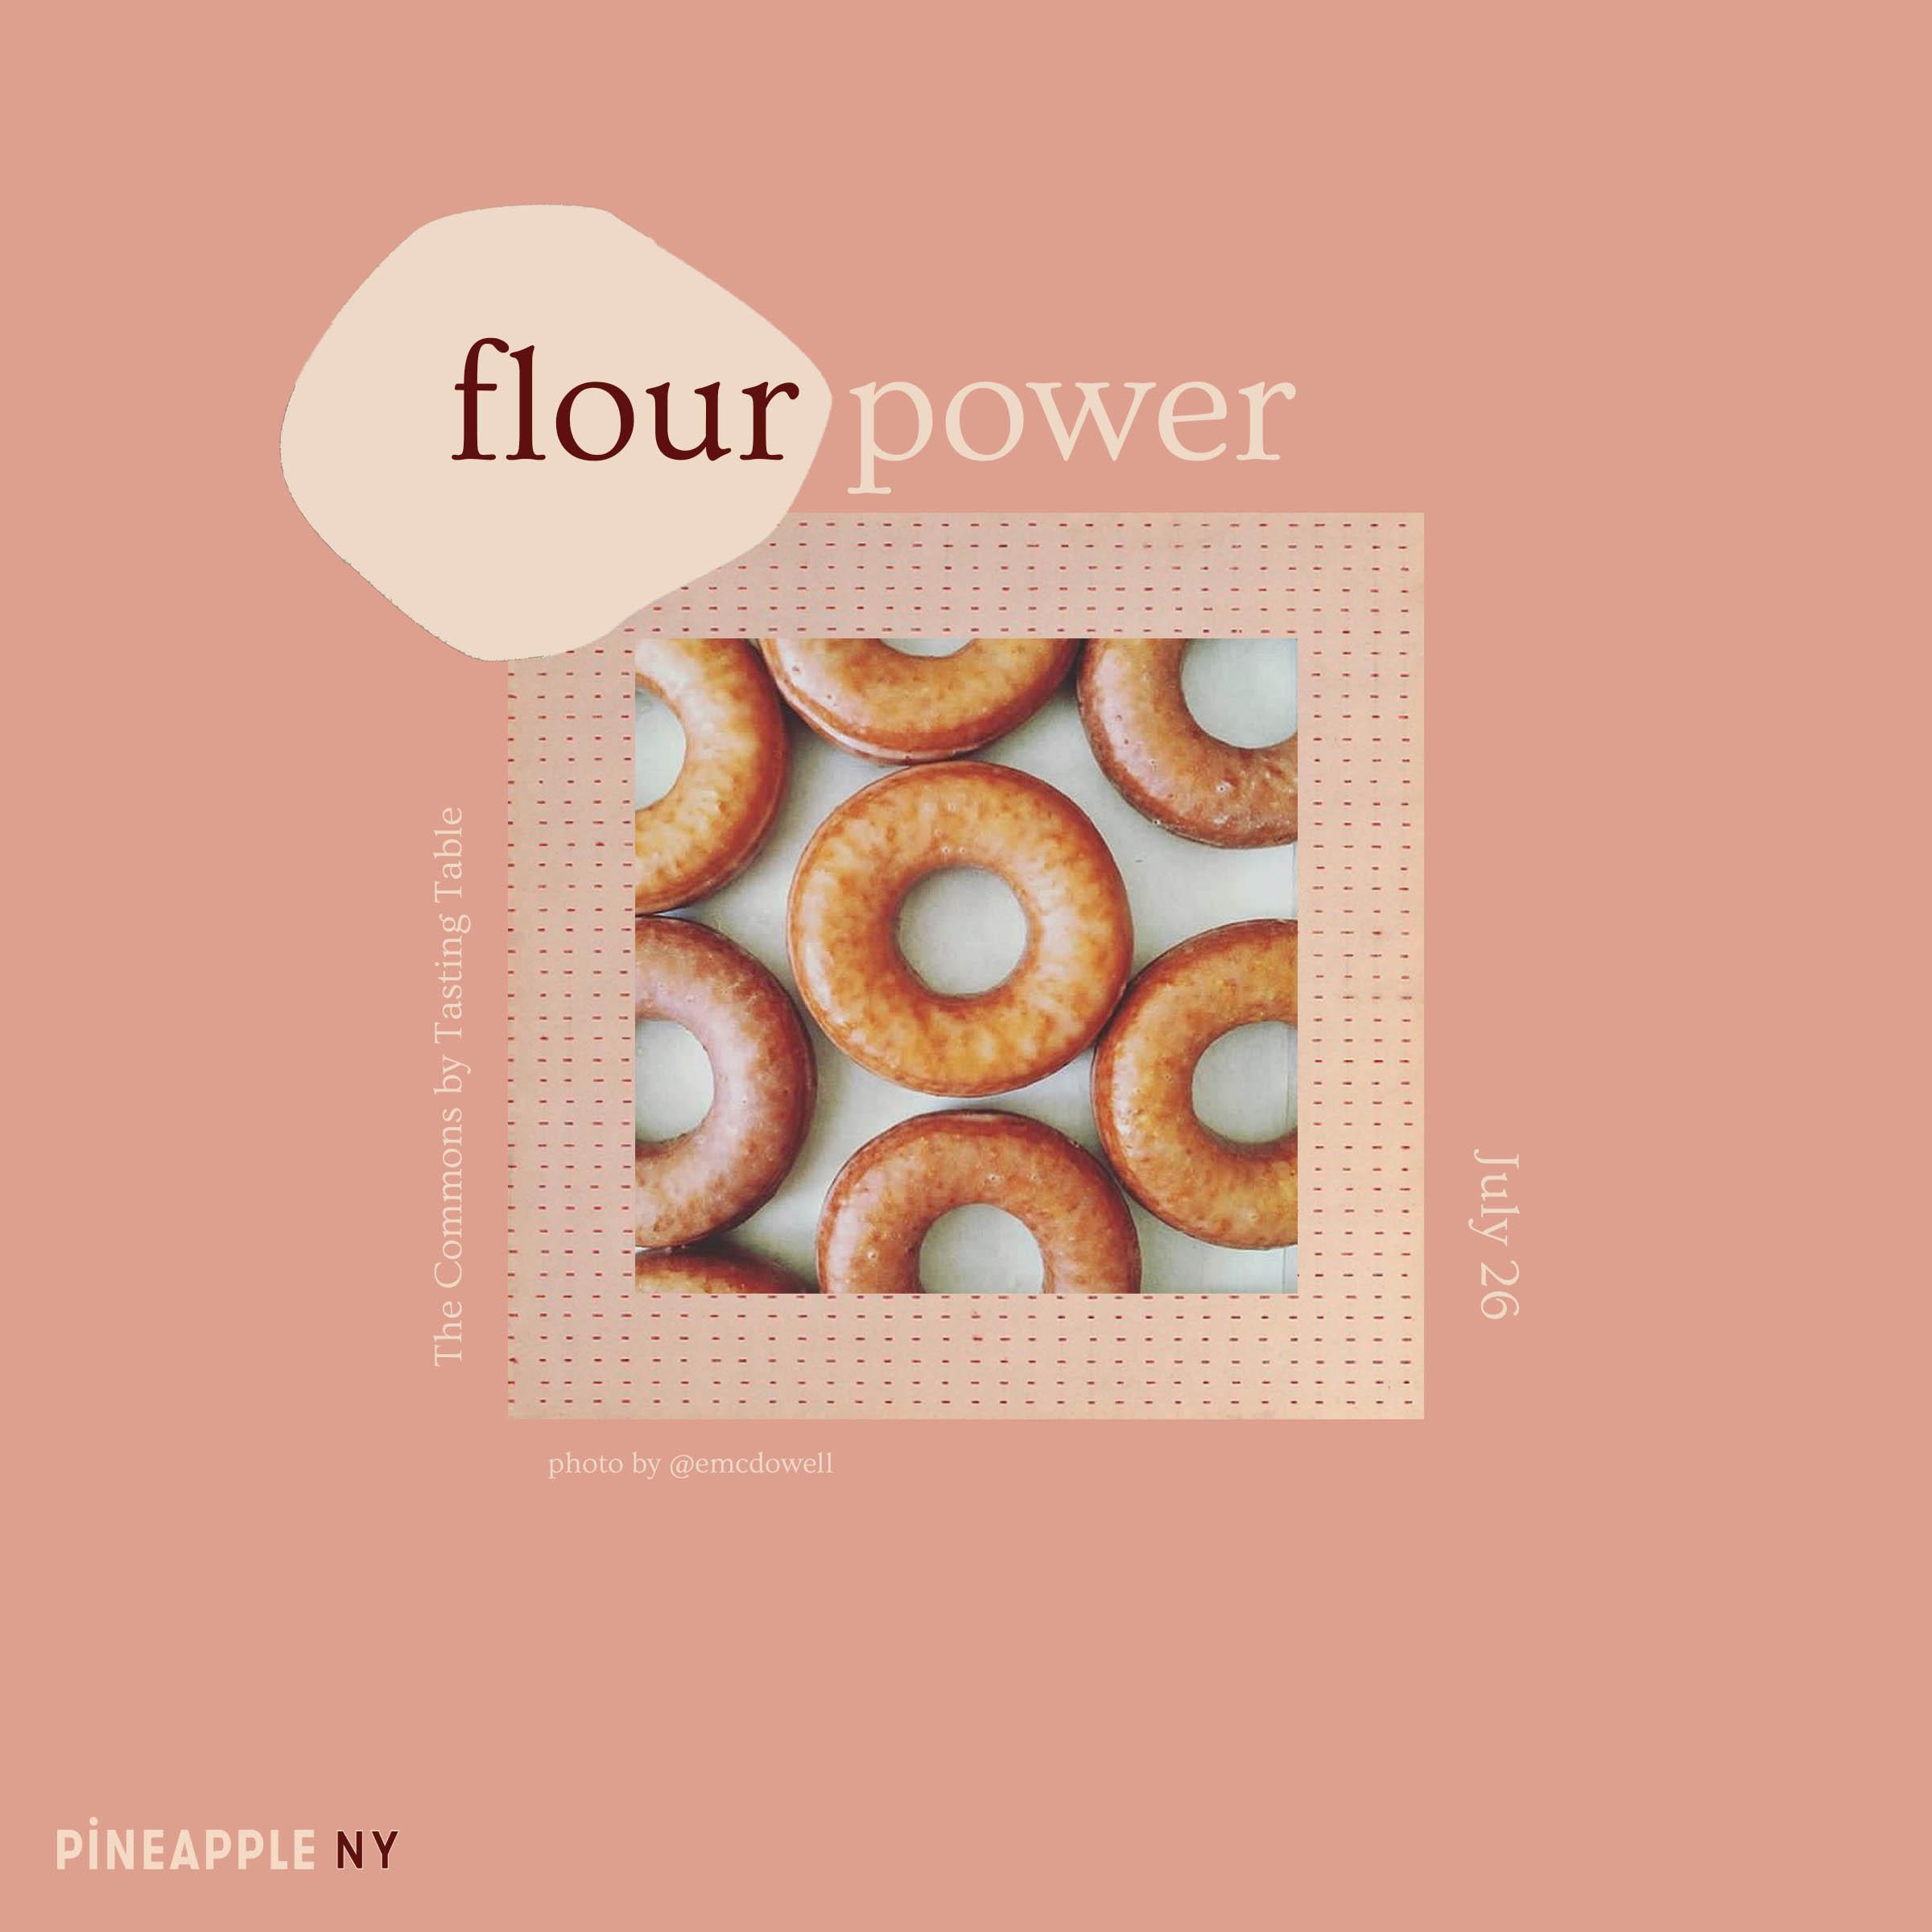 flourpower copy.jpg